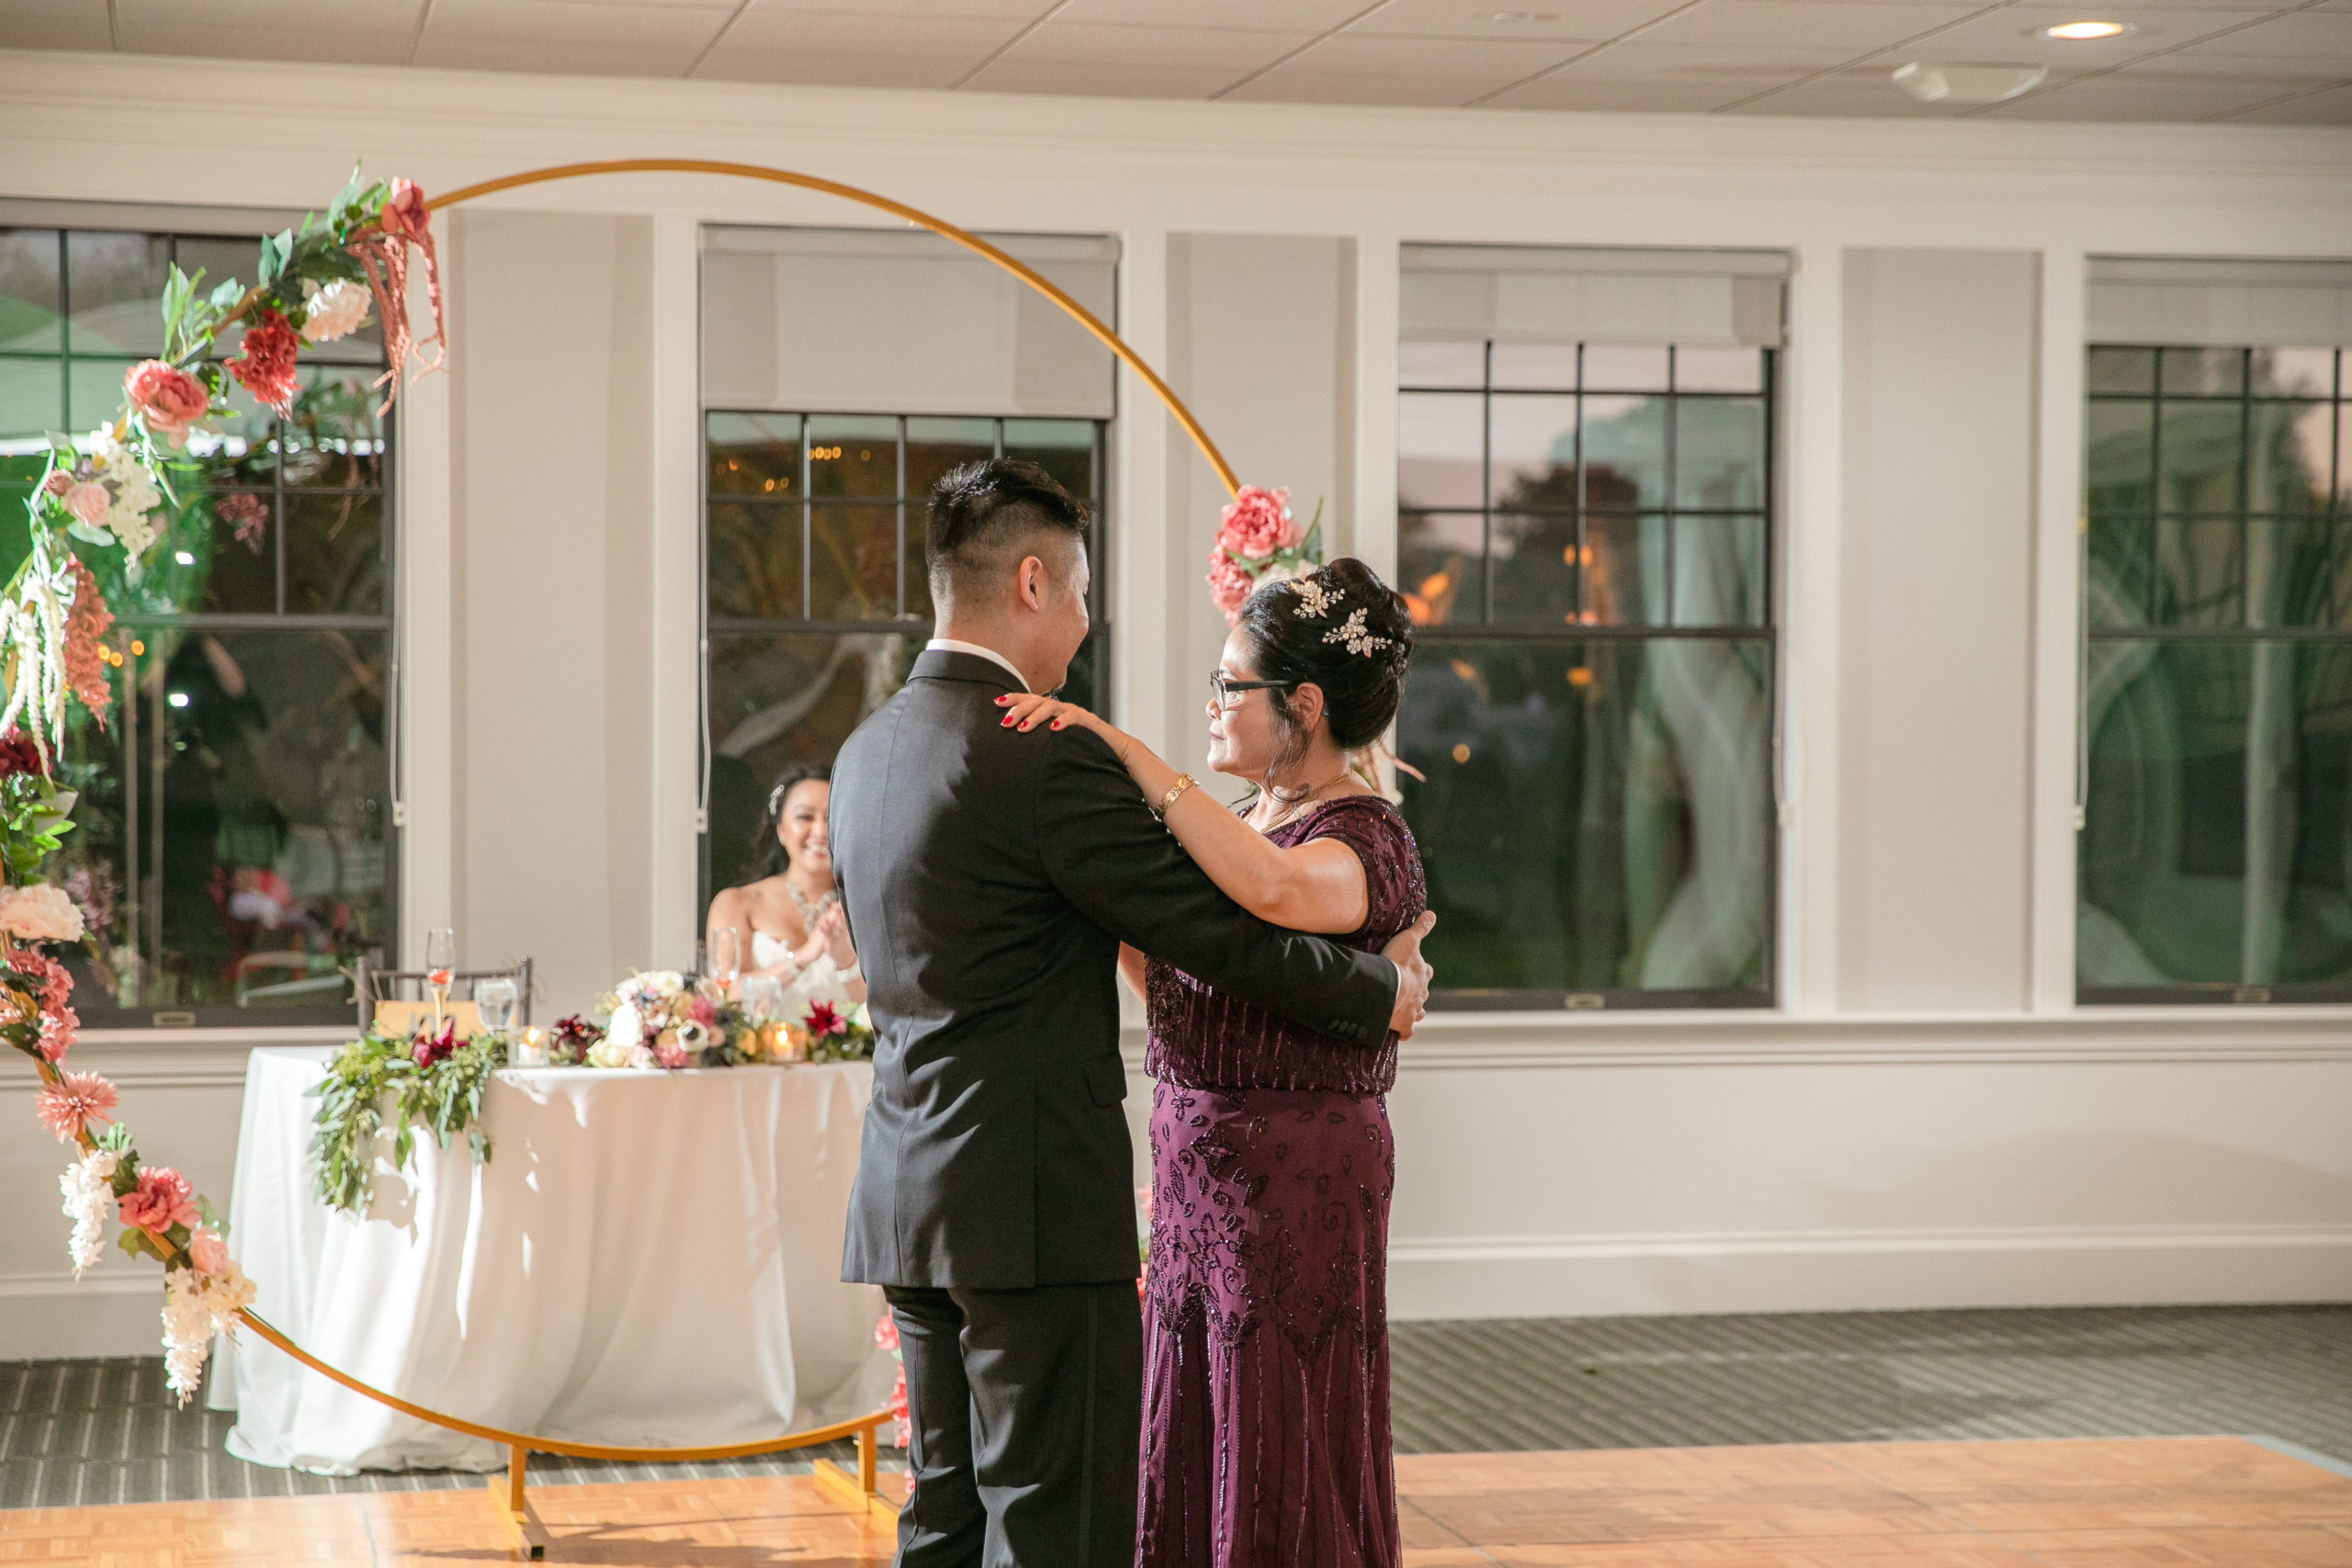 Harbor lights, warwick, rhode island, RI, Tracy Jenkins Photography, RI wedding photographer, Rhode Island wedding photographer, micro-wedding, mother son dance, reception